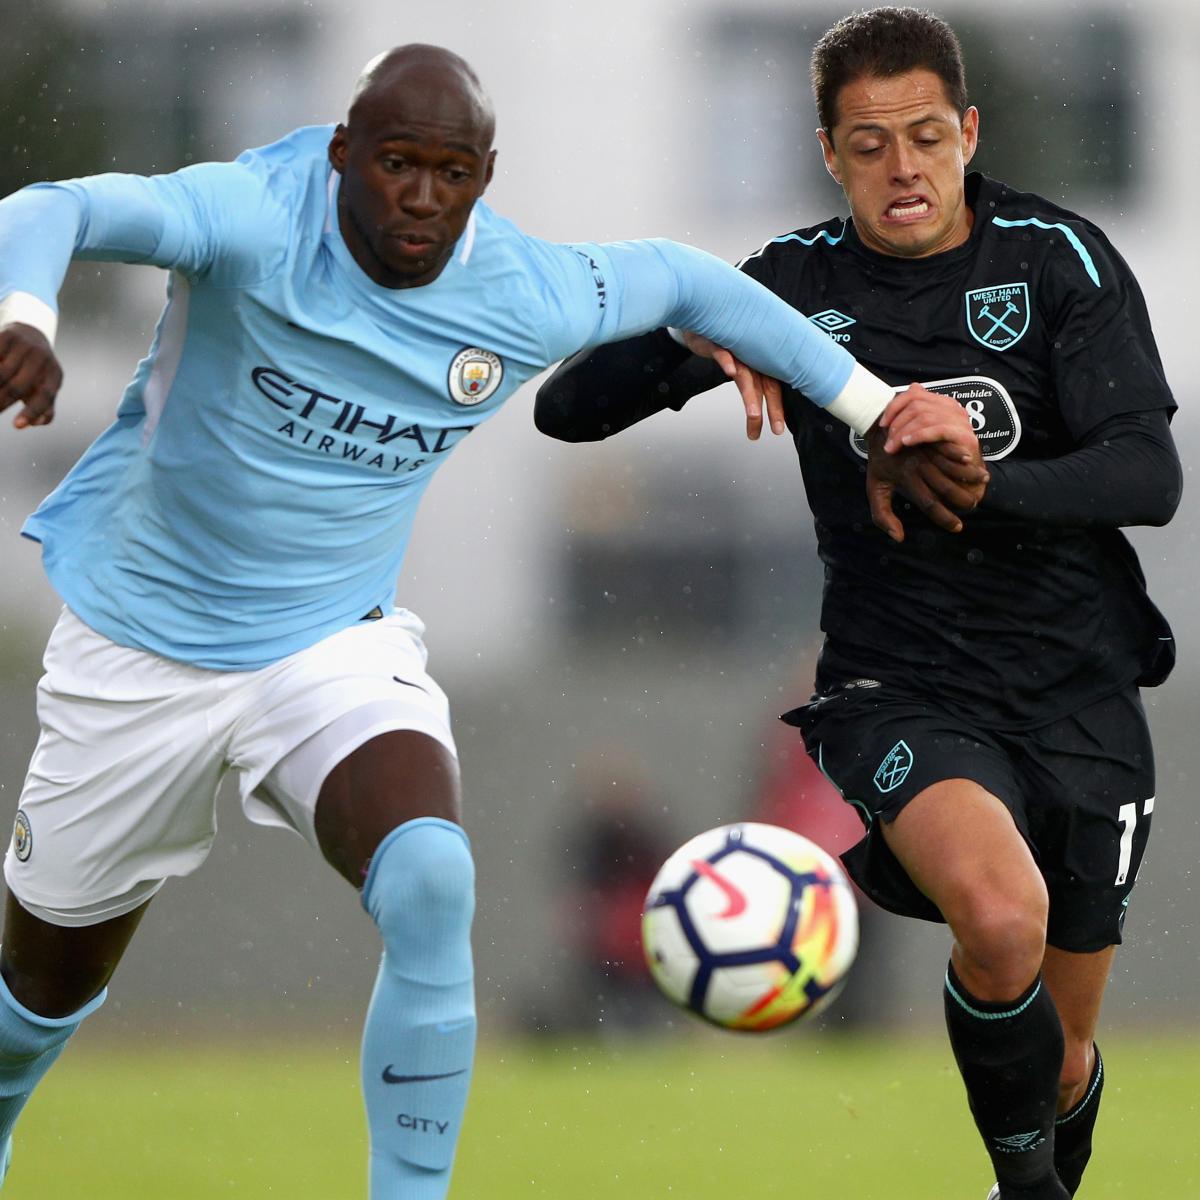 Manchester City Transfer News: Latest on Eliaquim Mangala and Samir Nasri